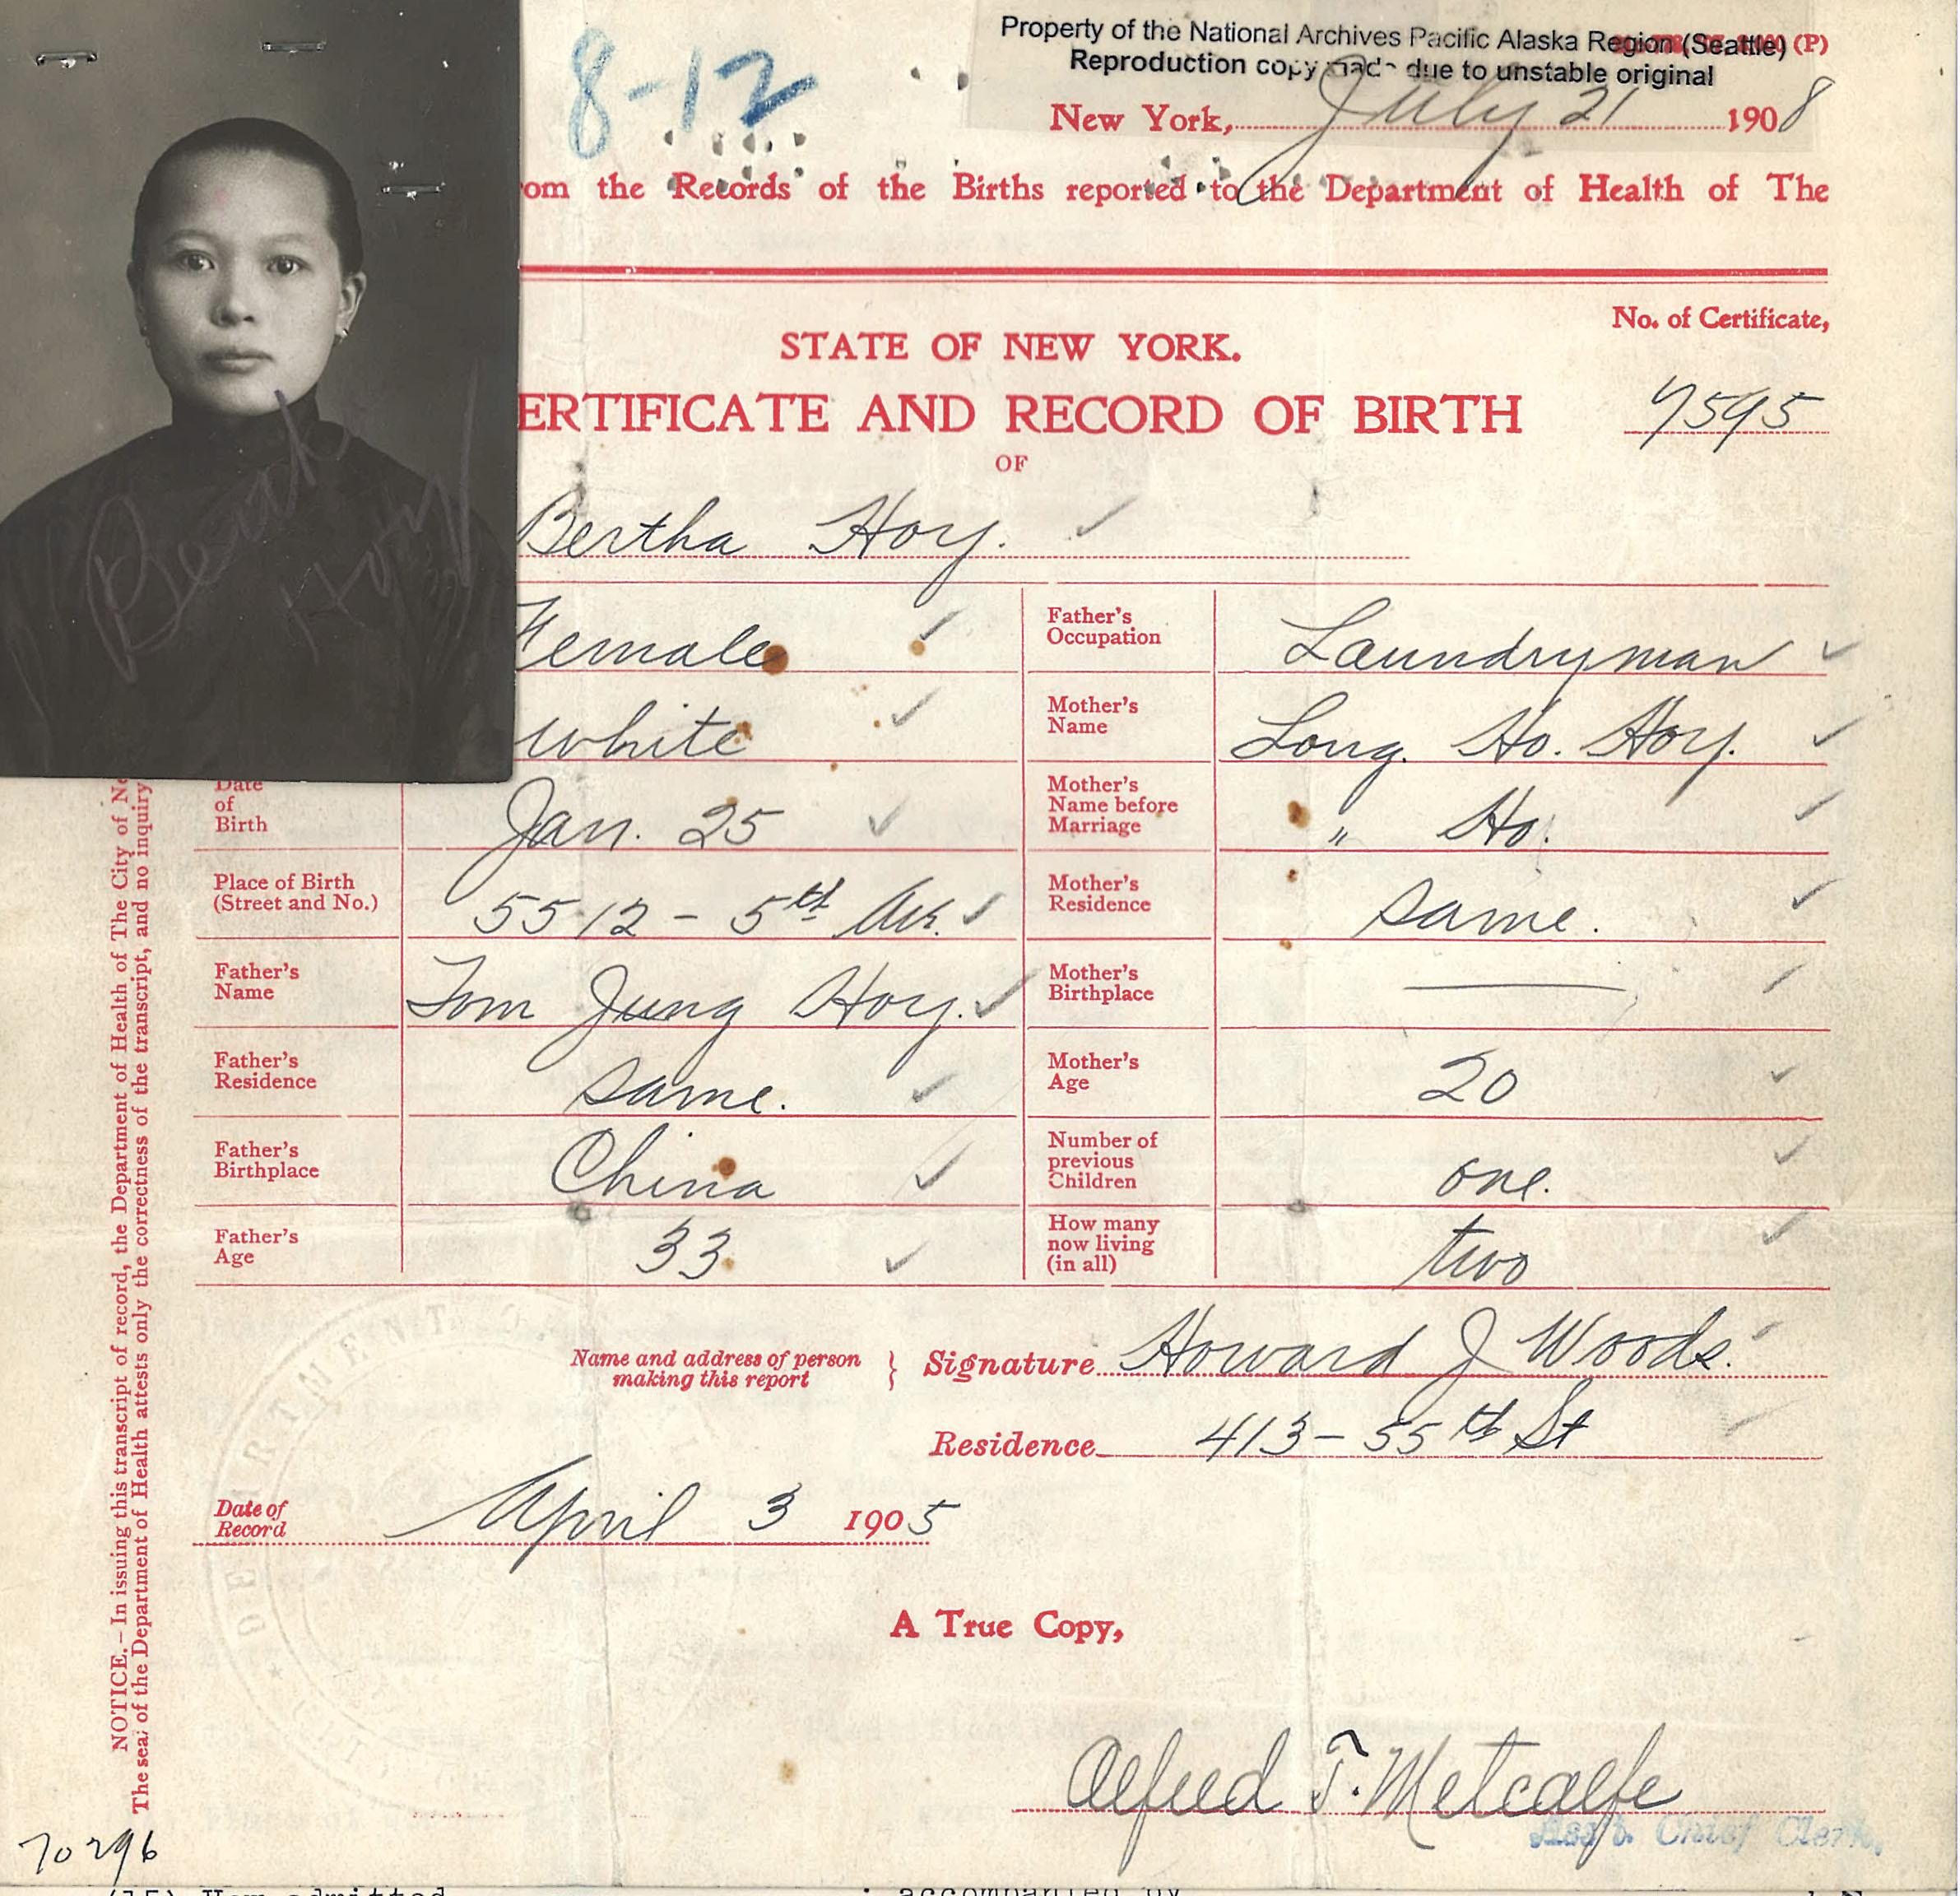 Bertha hoy 1905 nyc birth certificate chinese exclusion act birth certificate for bertha hoy 1905 aiddatafo Choice Image